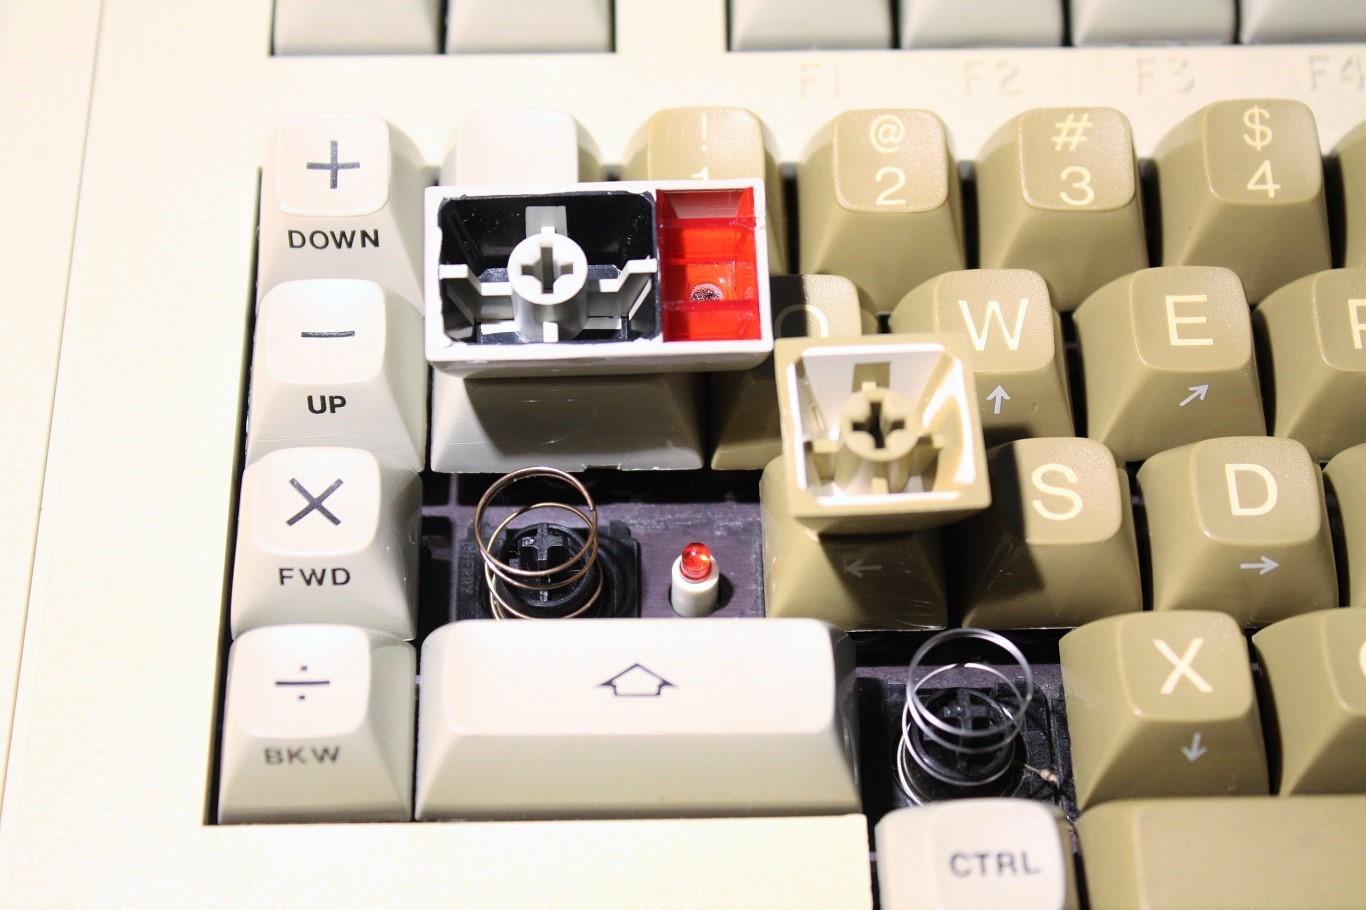 Cherry Terminal Keyboard - key caps.jpg